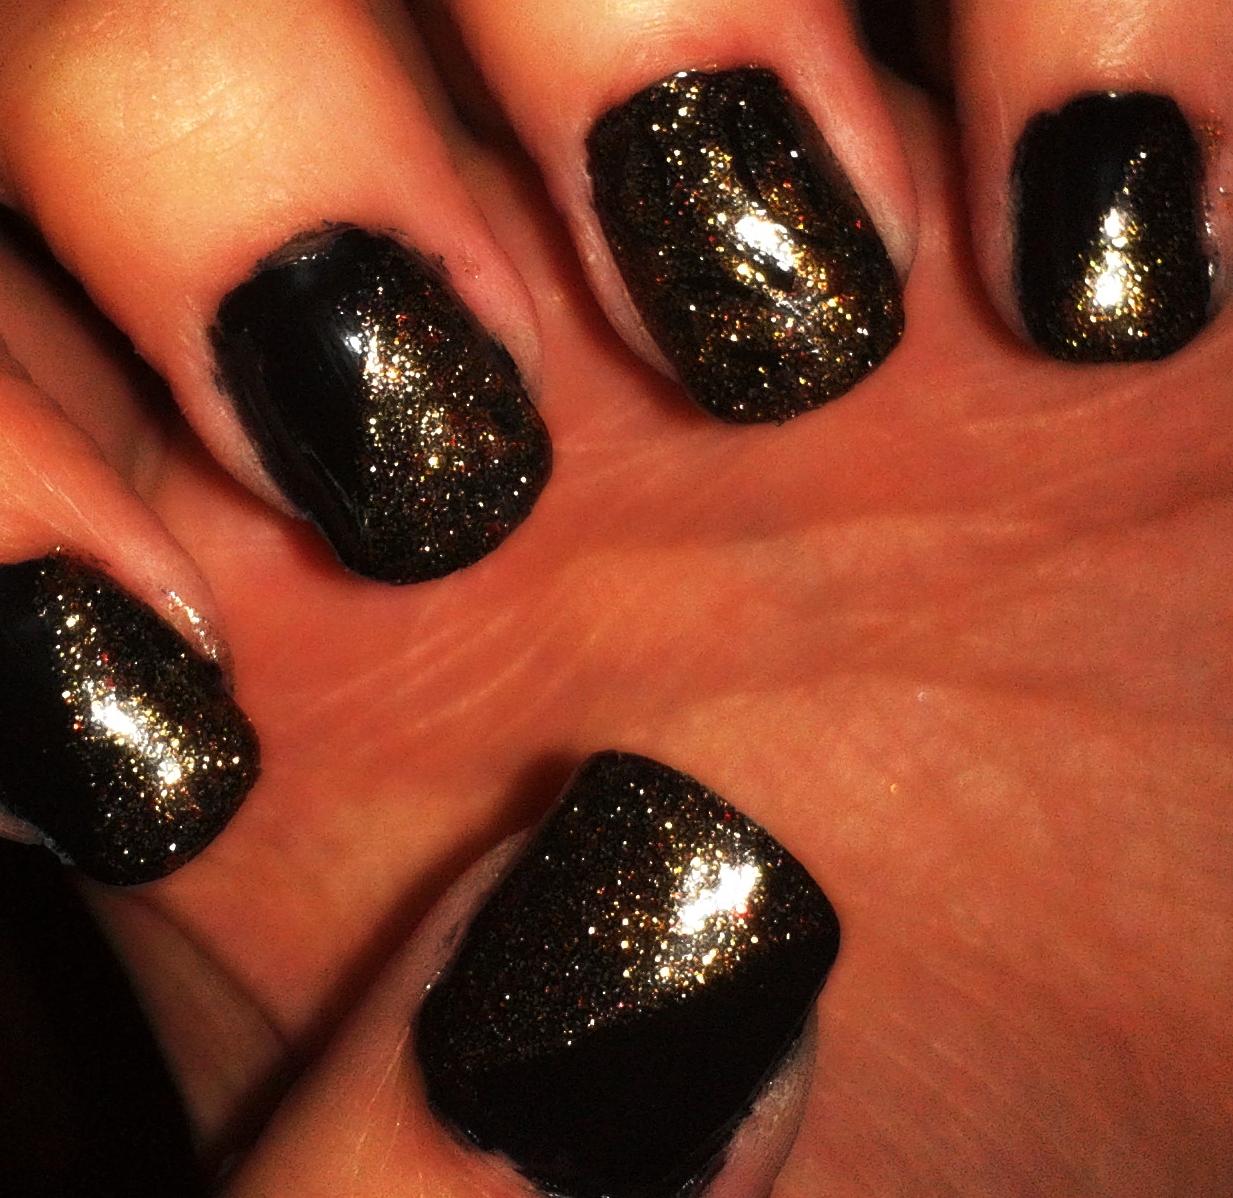 nails for everyone. Black Bedroom Furniture Sets. Home Design Ideas